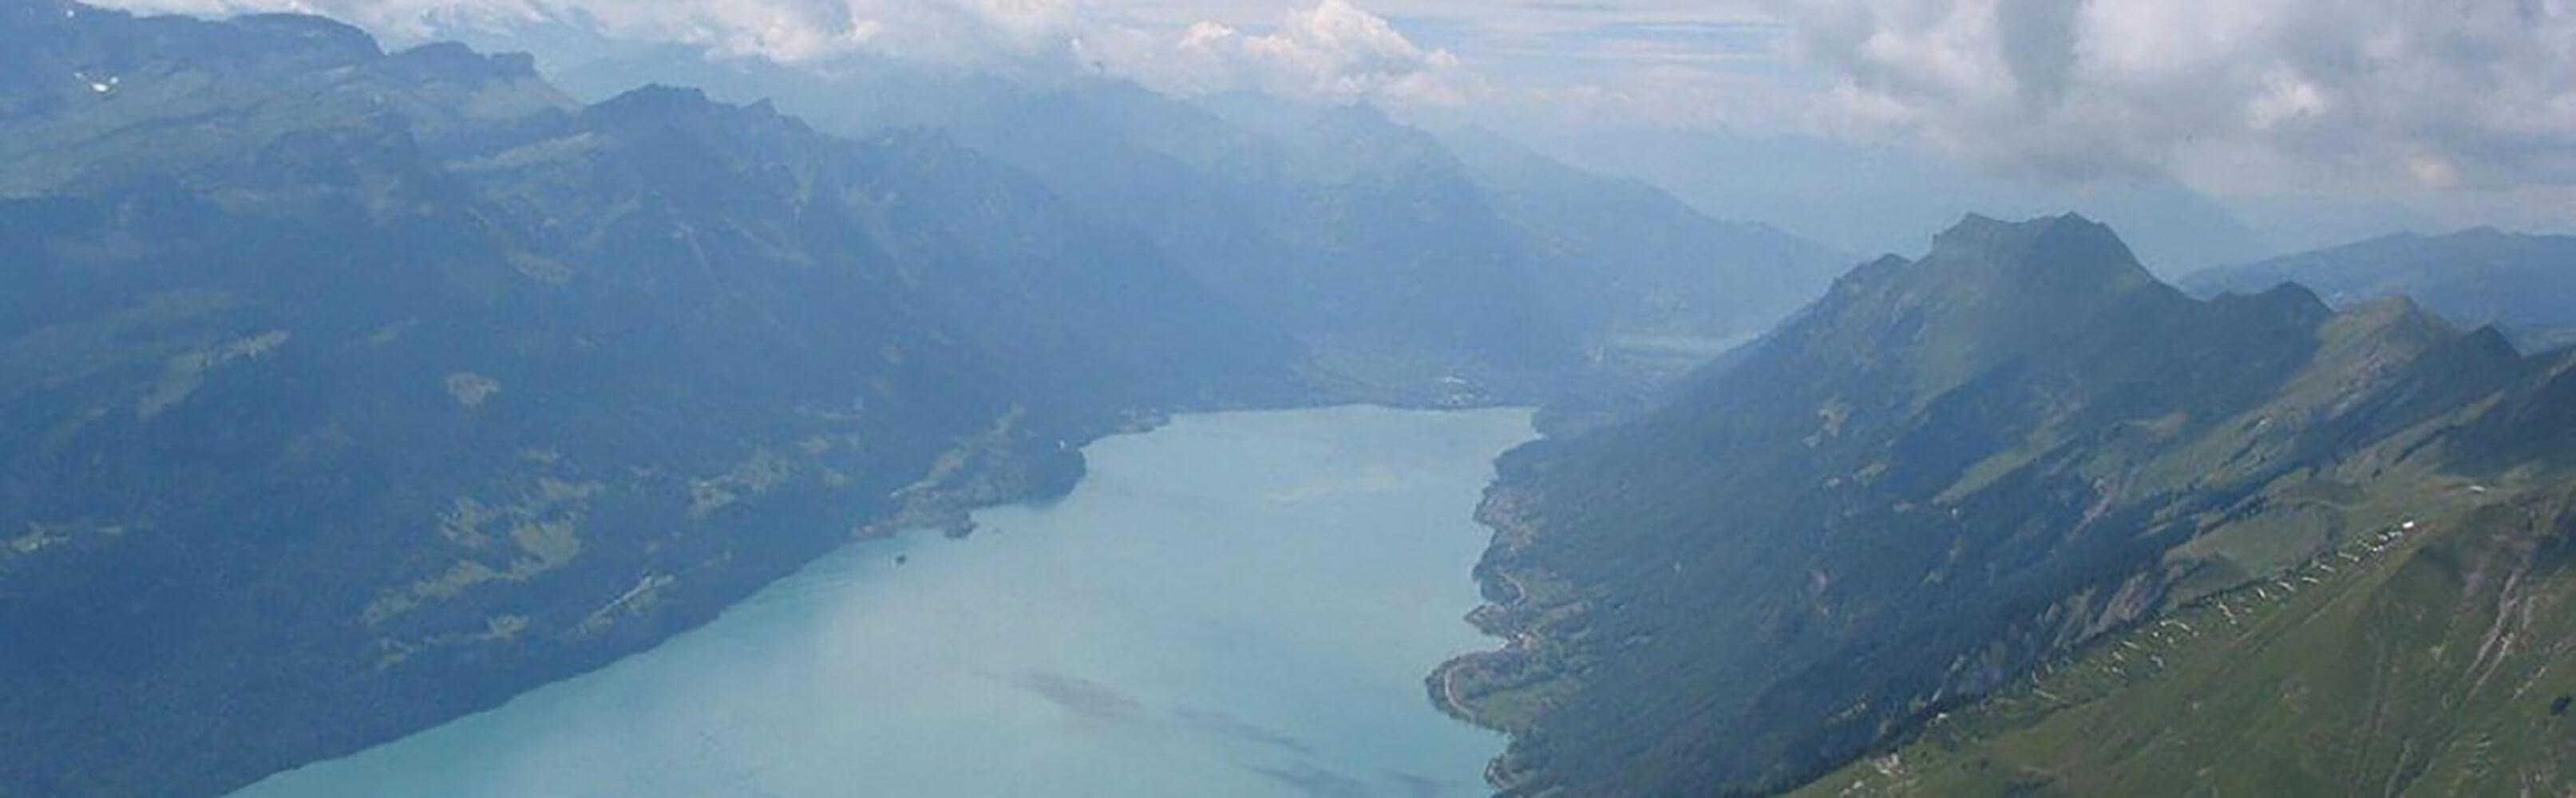 Sörenberg das Paradies im Kanton Luzern 1